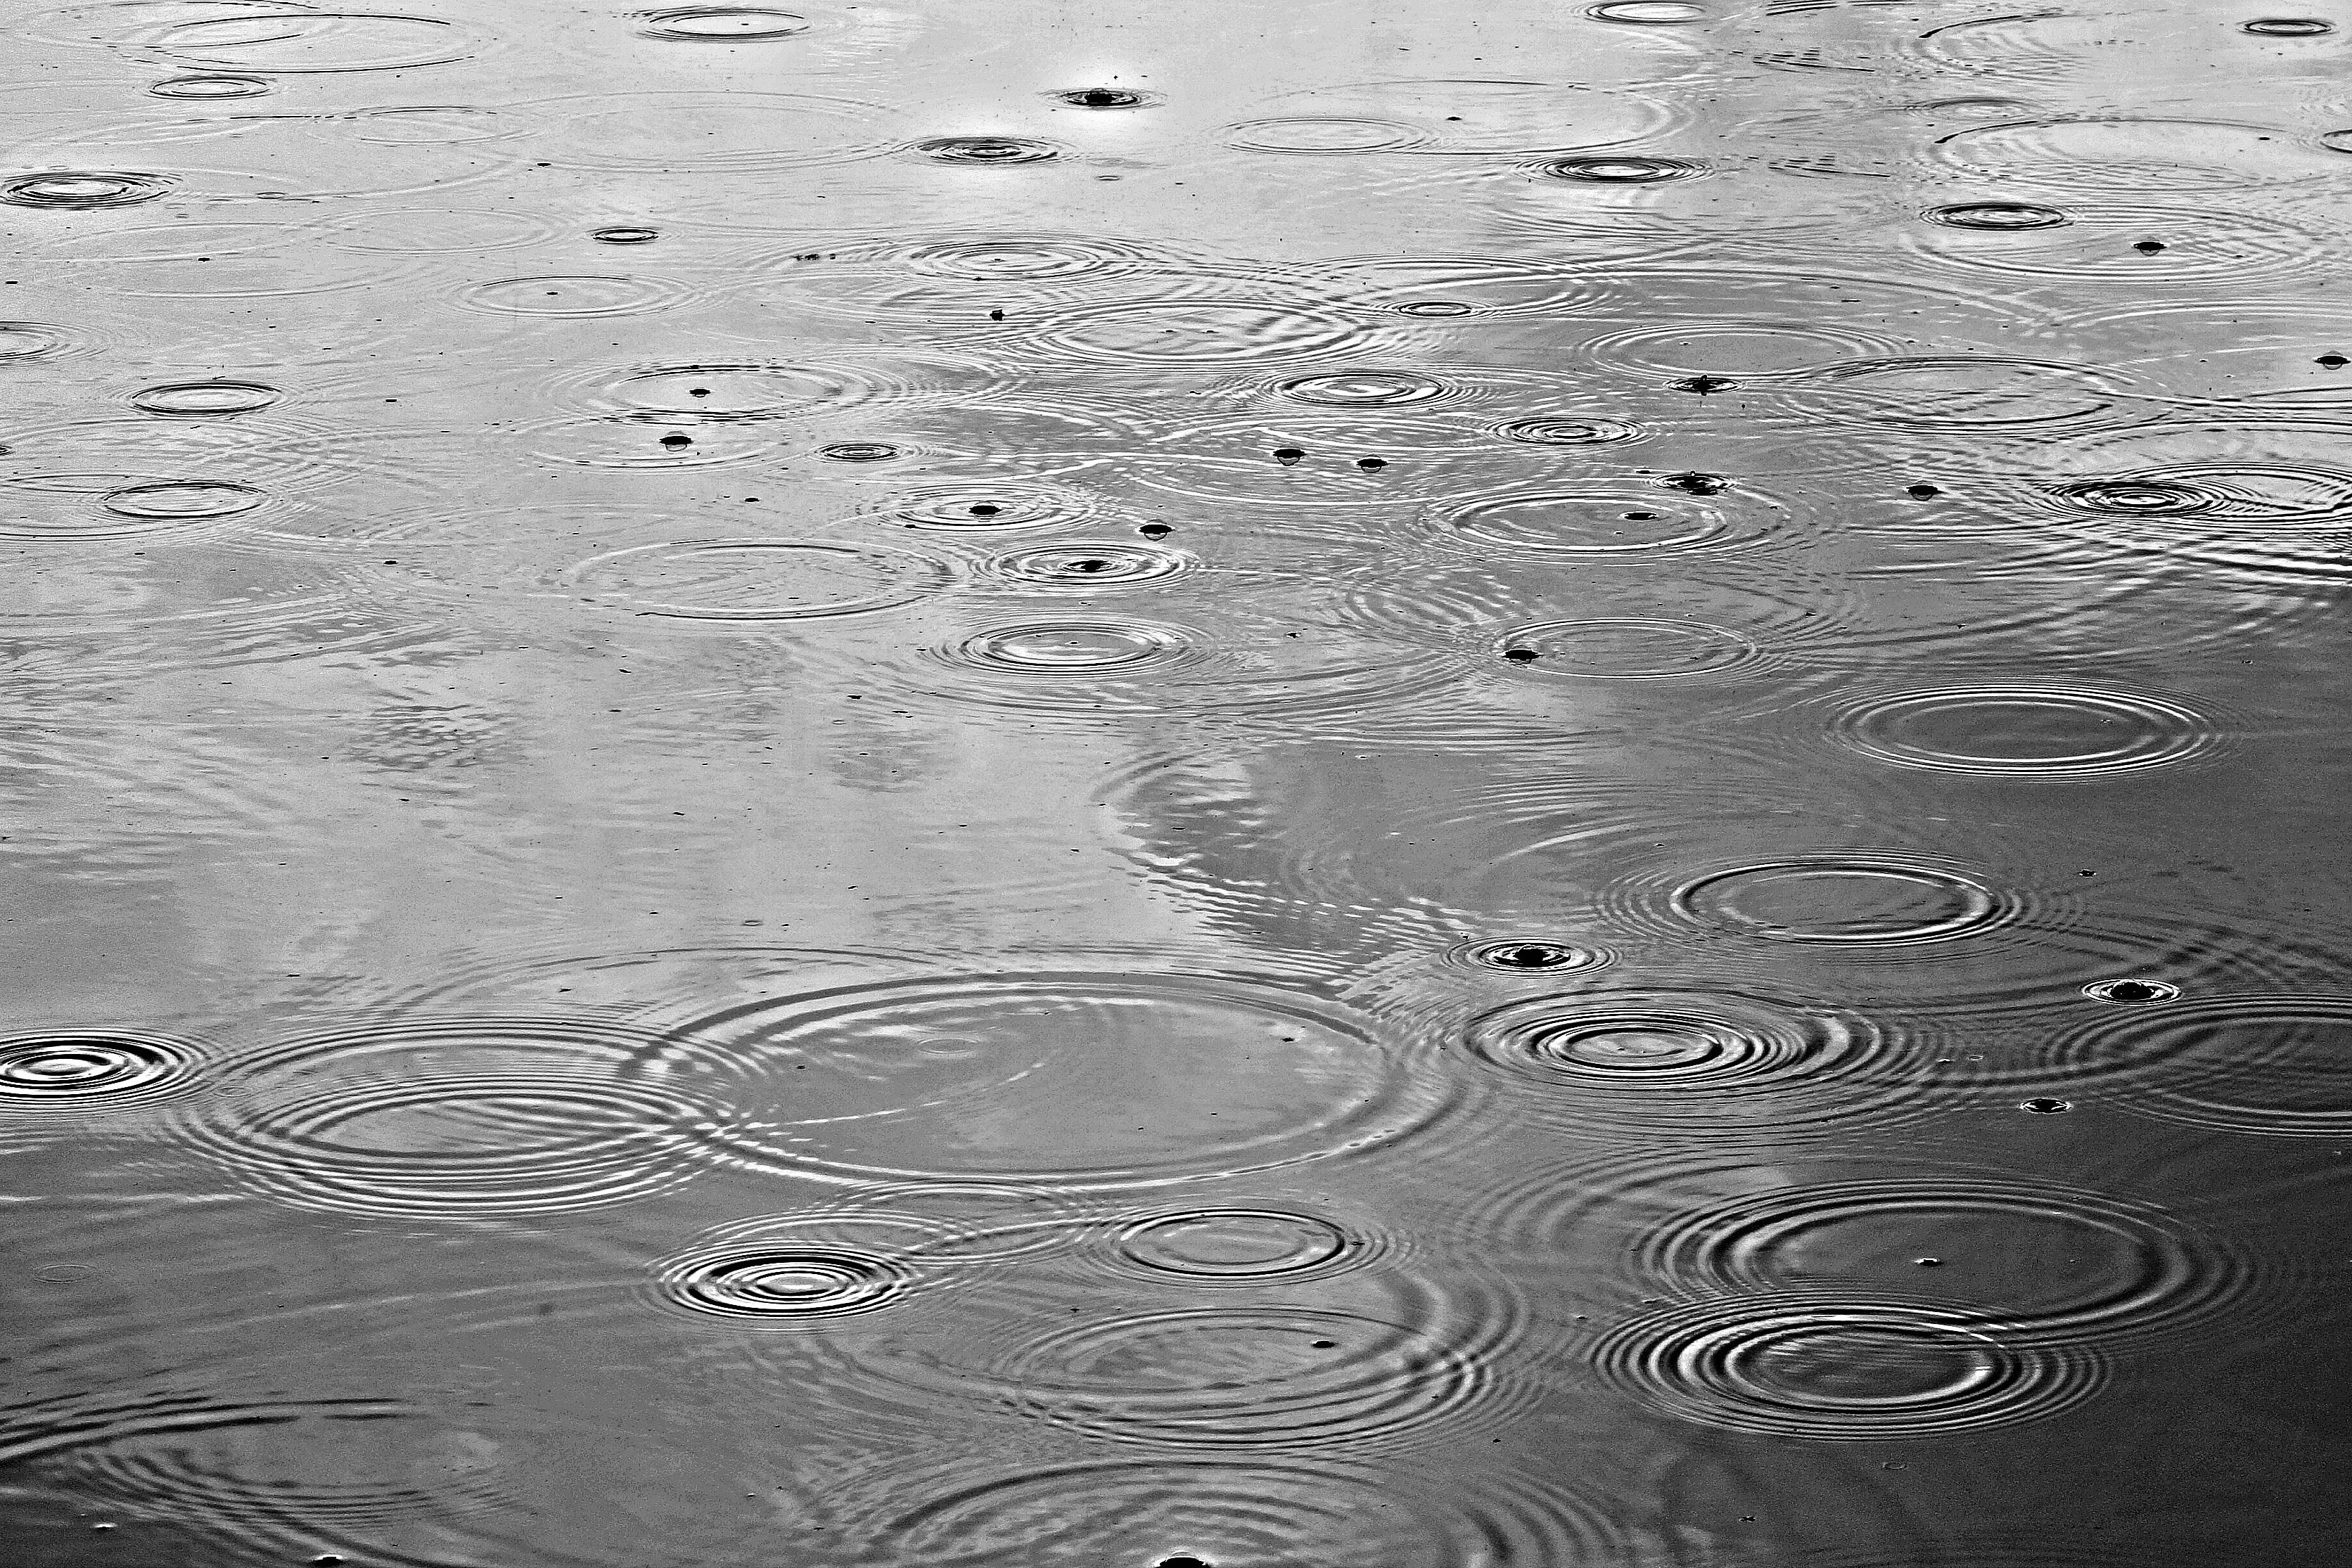 Gambar Penurunan Hitam Dan Putih Kayu Tekstur Tetesan Air